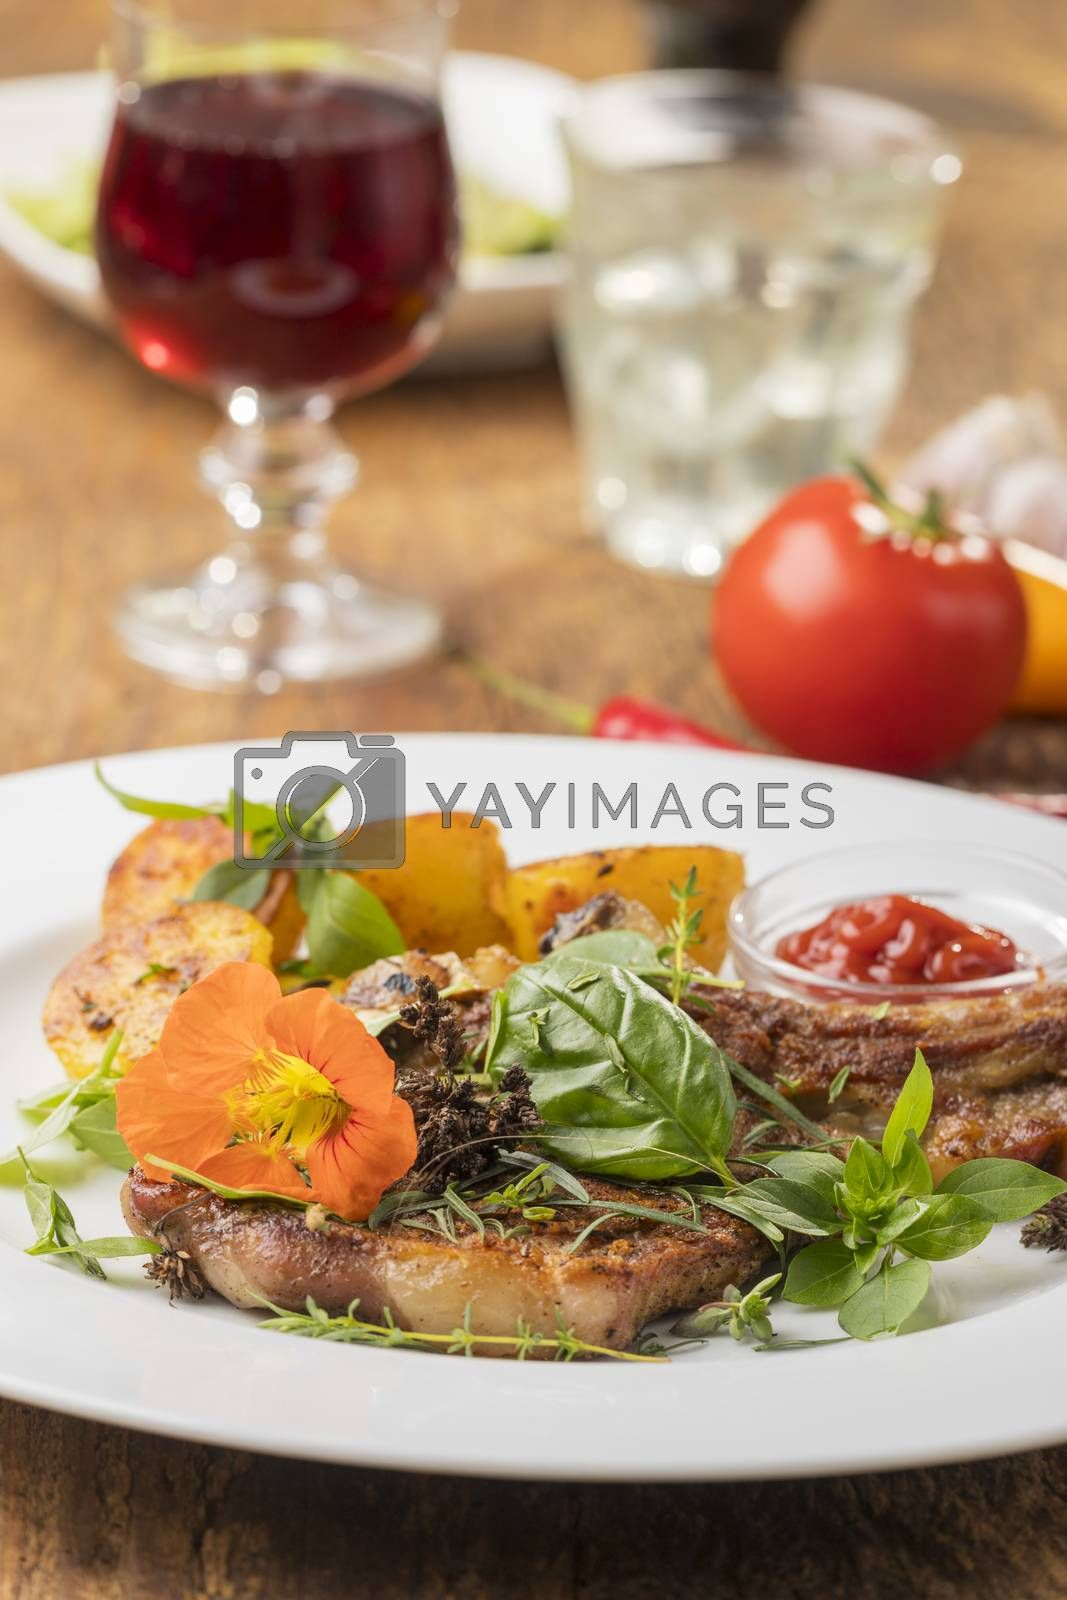 grilled veal cutlet with a nasturtium flower